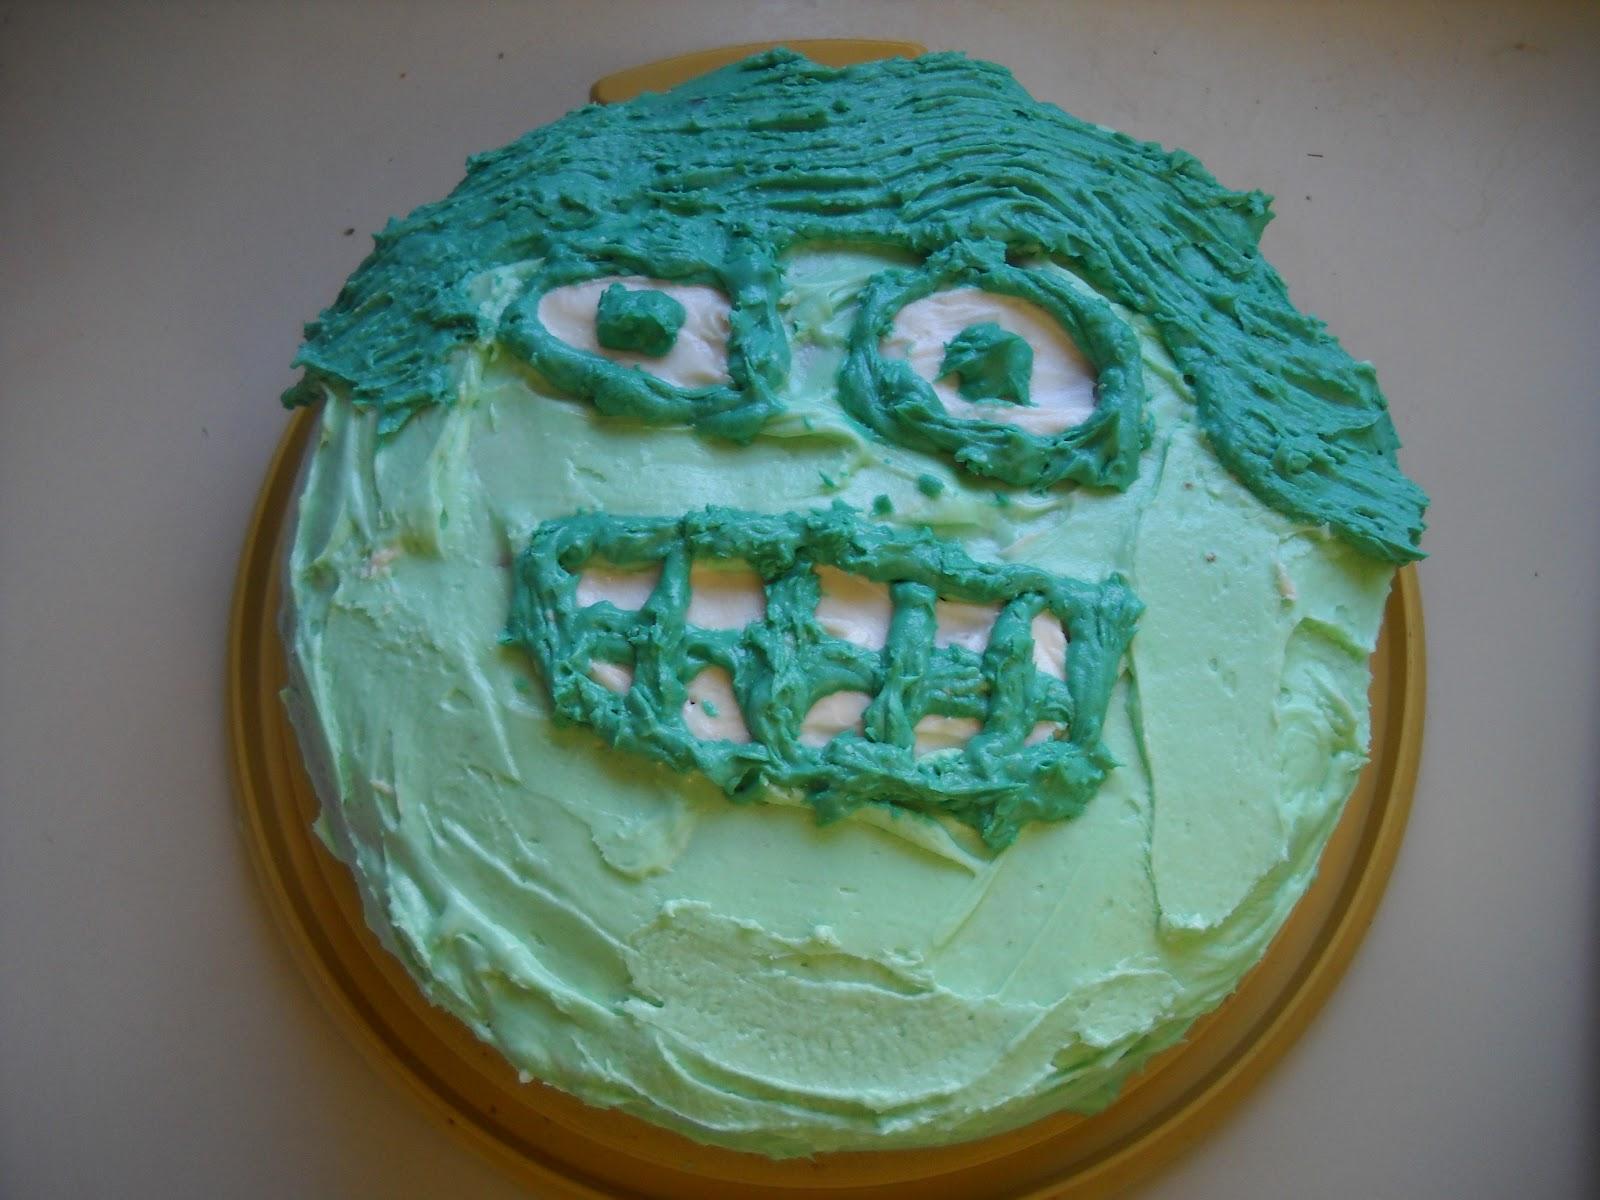 Good Cakes VS Bad Cakes Gallery eBaums World